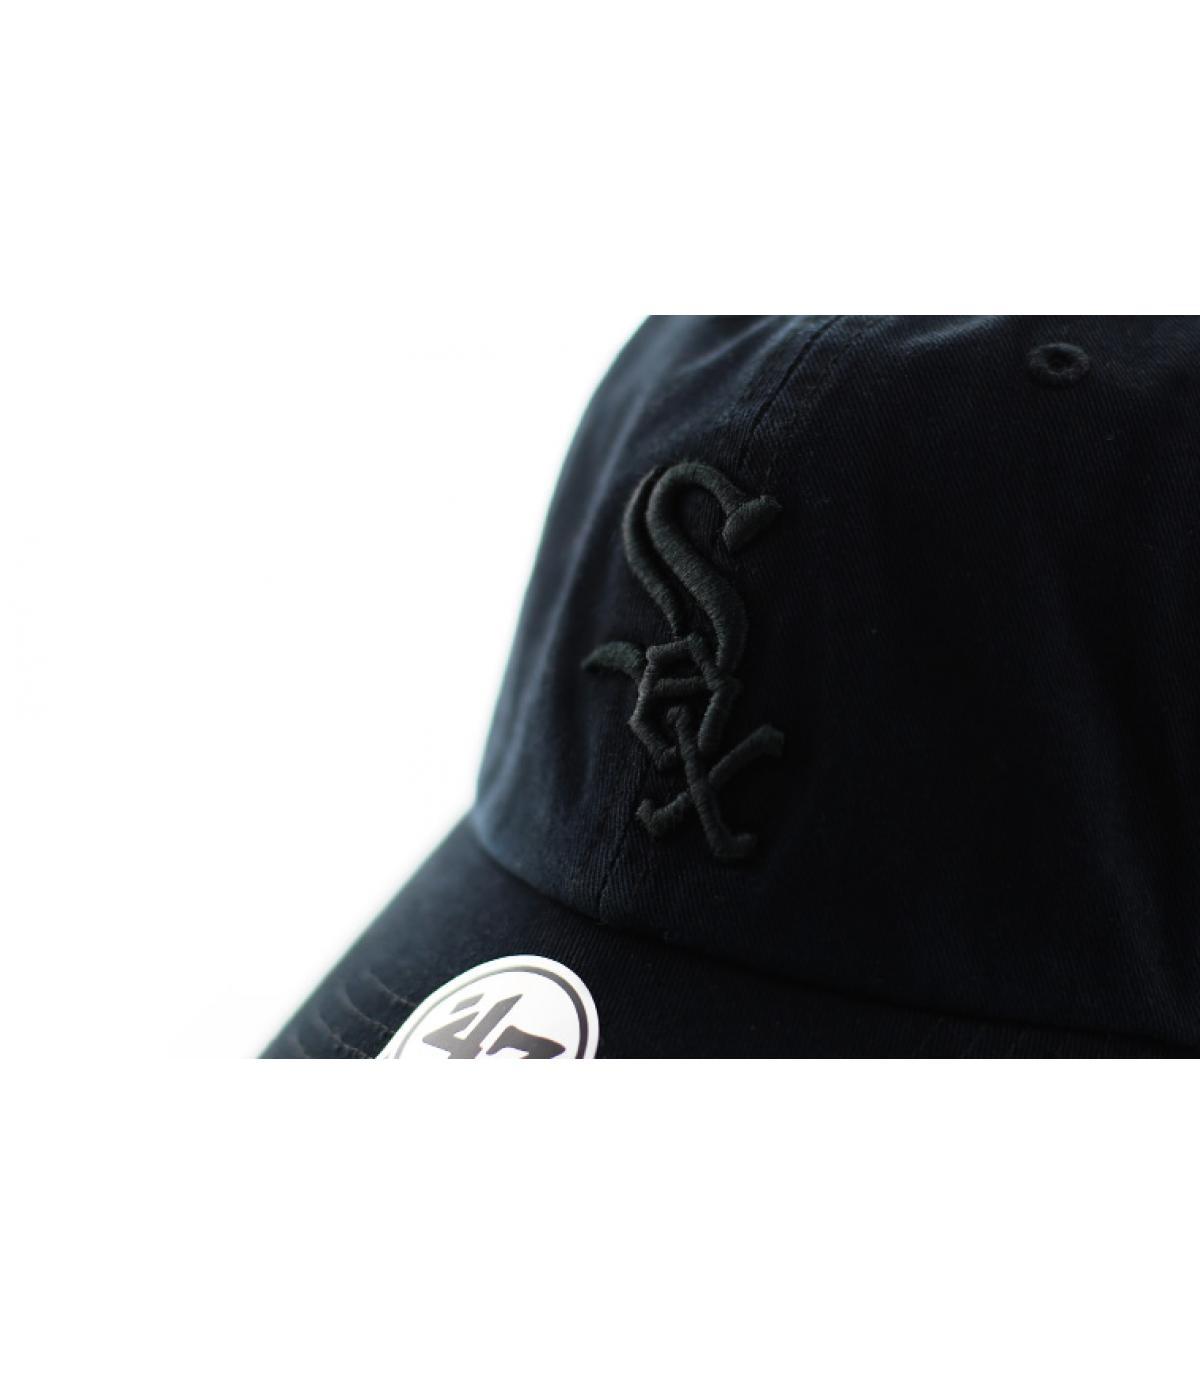 Detalles Clean Up Sox black black imagen 3